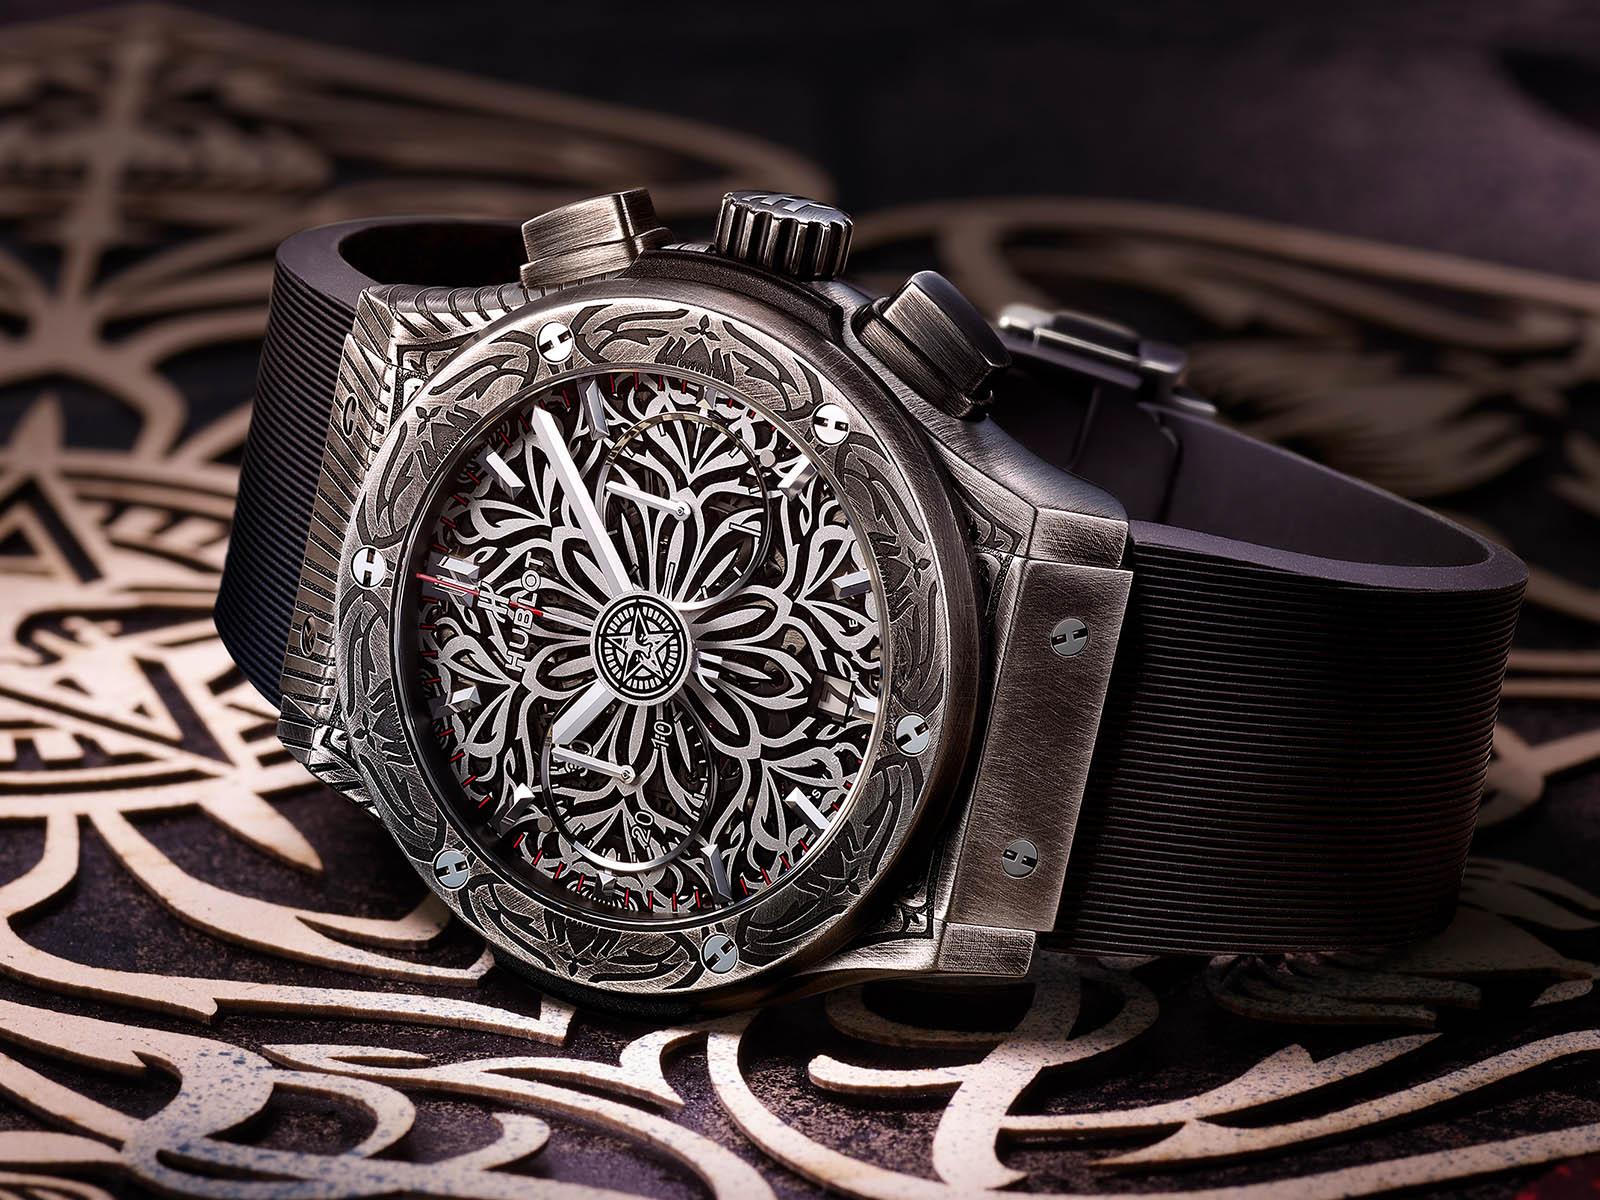 525-nx-0137-rx-shf21-hublot-classic-fusion-chronograph-shepard-fairey-5.jpg